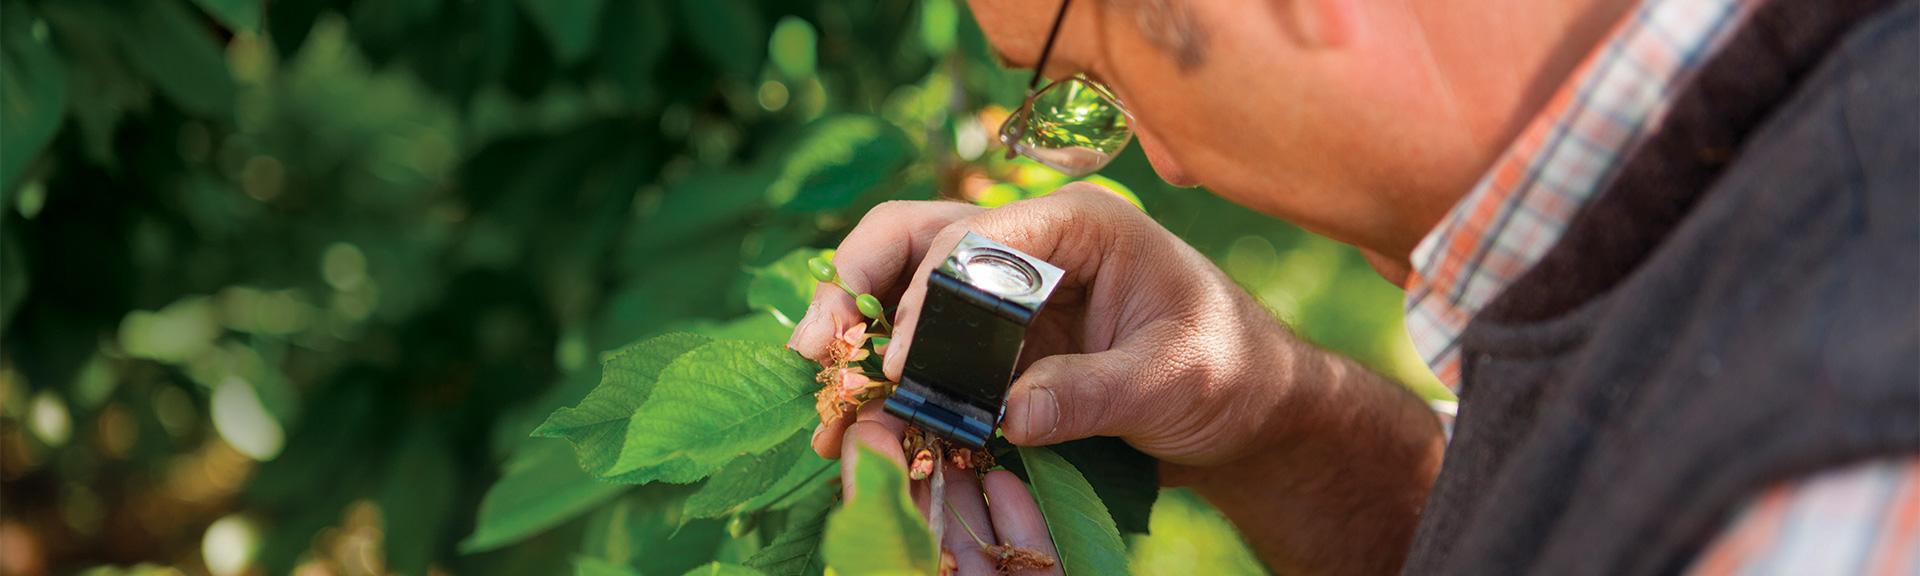 Sultan™ Miticide | BASF Ornamental Plant Care Products for